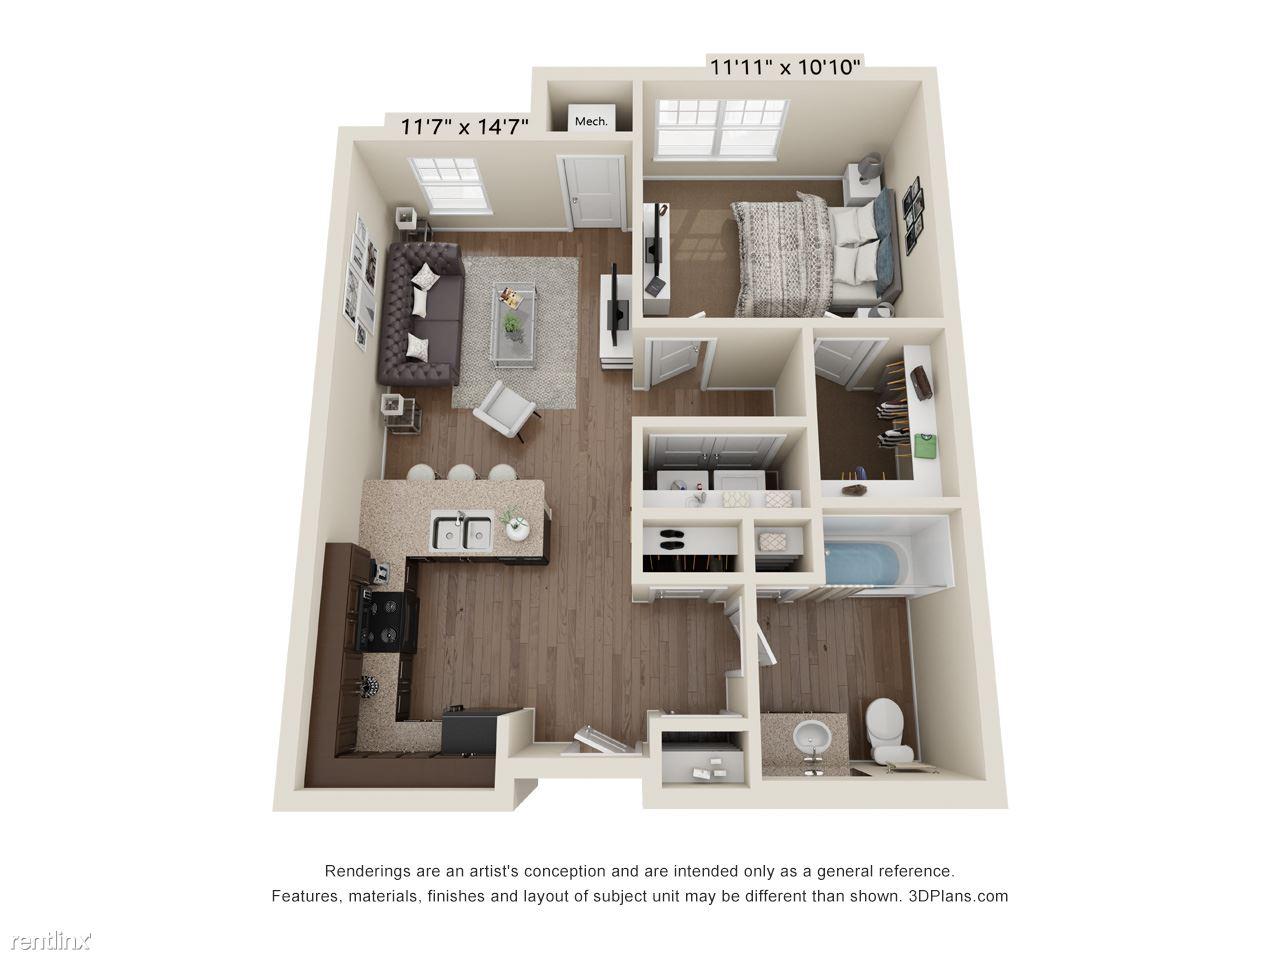 RiverWorks Lofts for rent